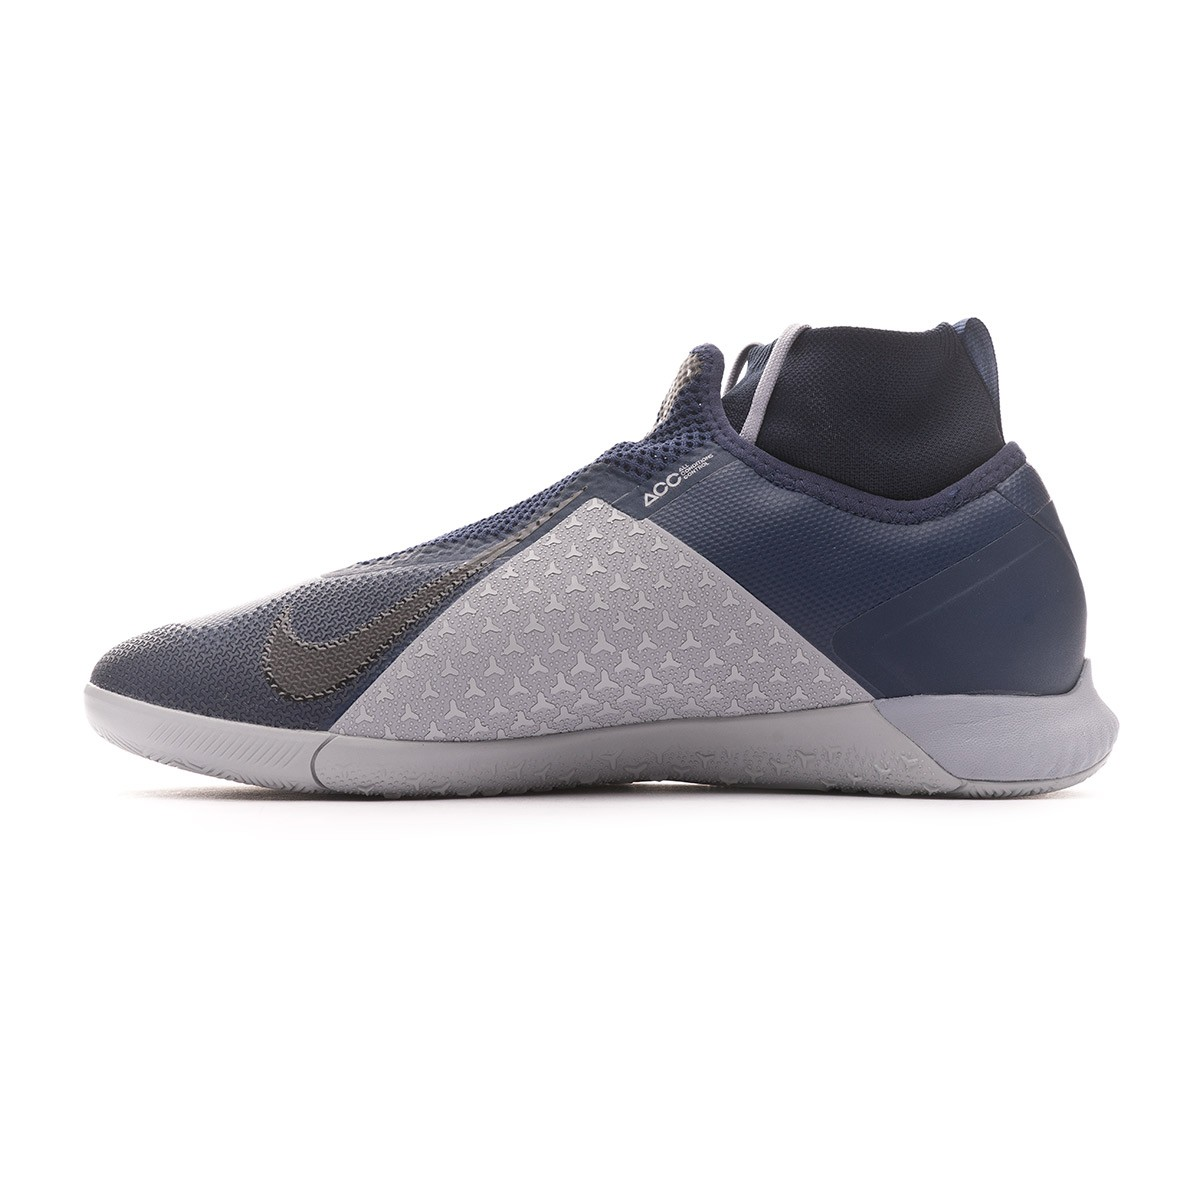 dbbc5b053 Futsal Boot Nike React Phantom Vision Pro DF IC Midnight navy-Black-Wolf  grey - Football store Fútbol Emotion